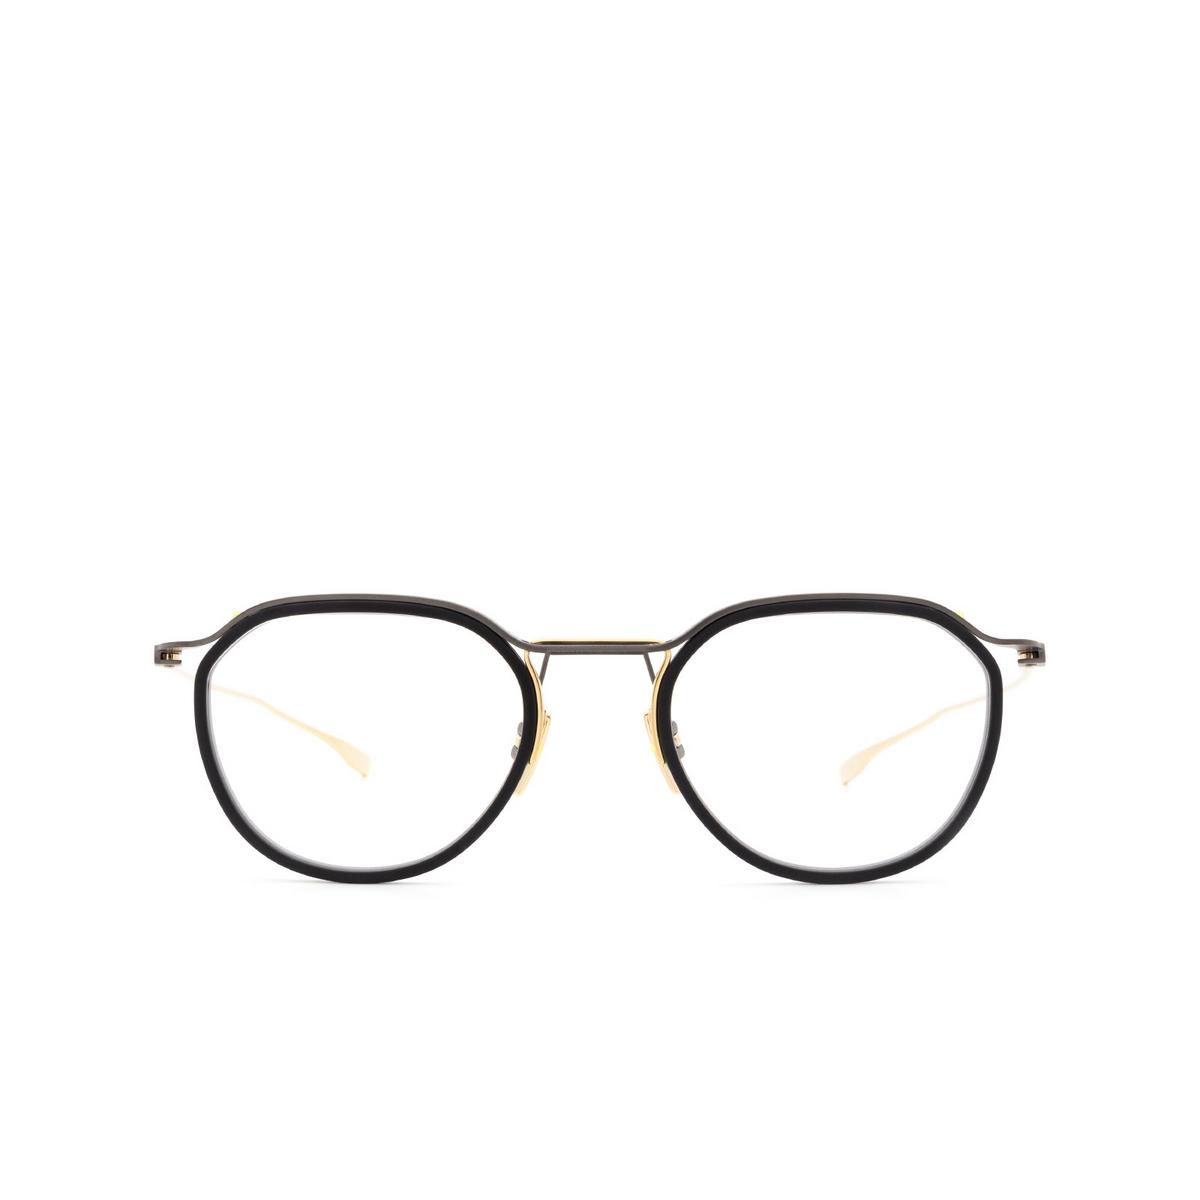 Dita® Square Eyeglasses: Schema-two DTX131-49-02-Z color Black & Gold Blk-gld.